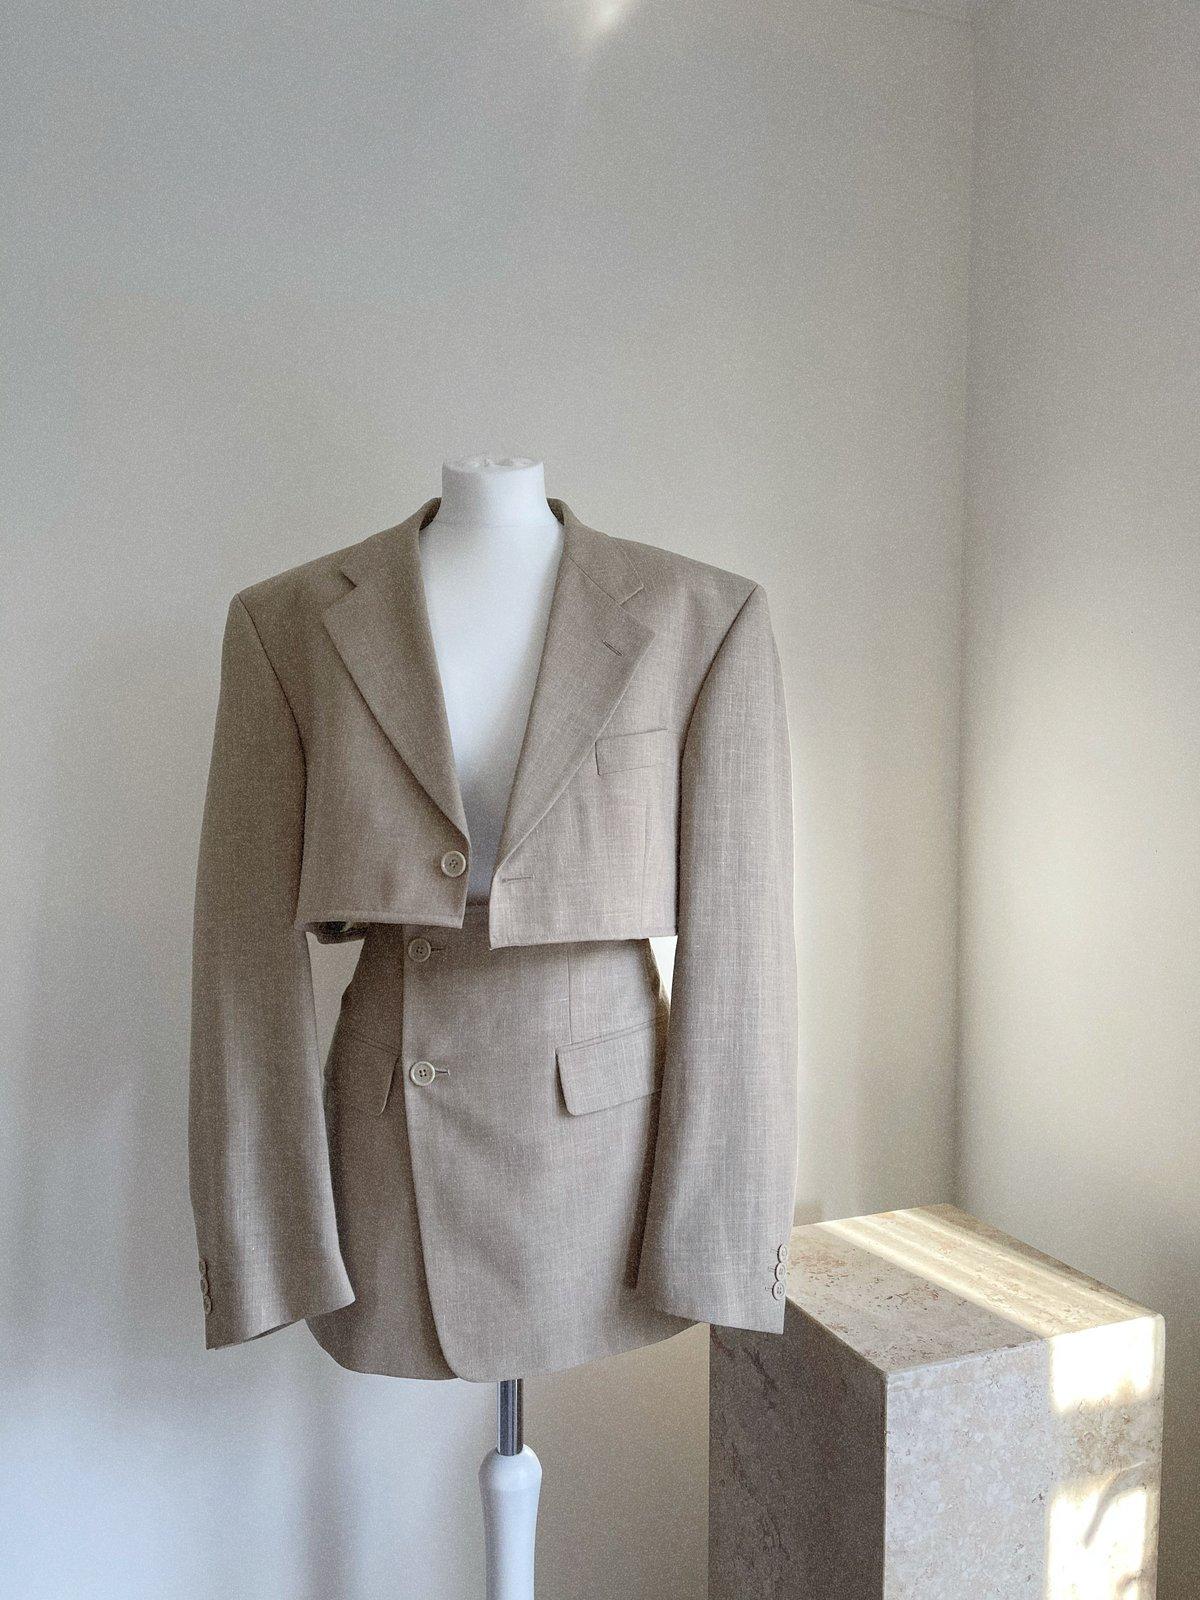 Reworked Beige Suit